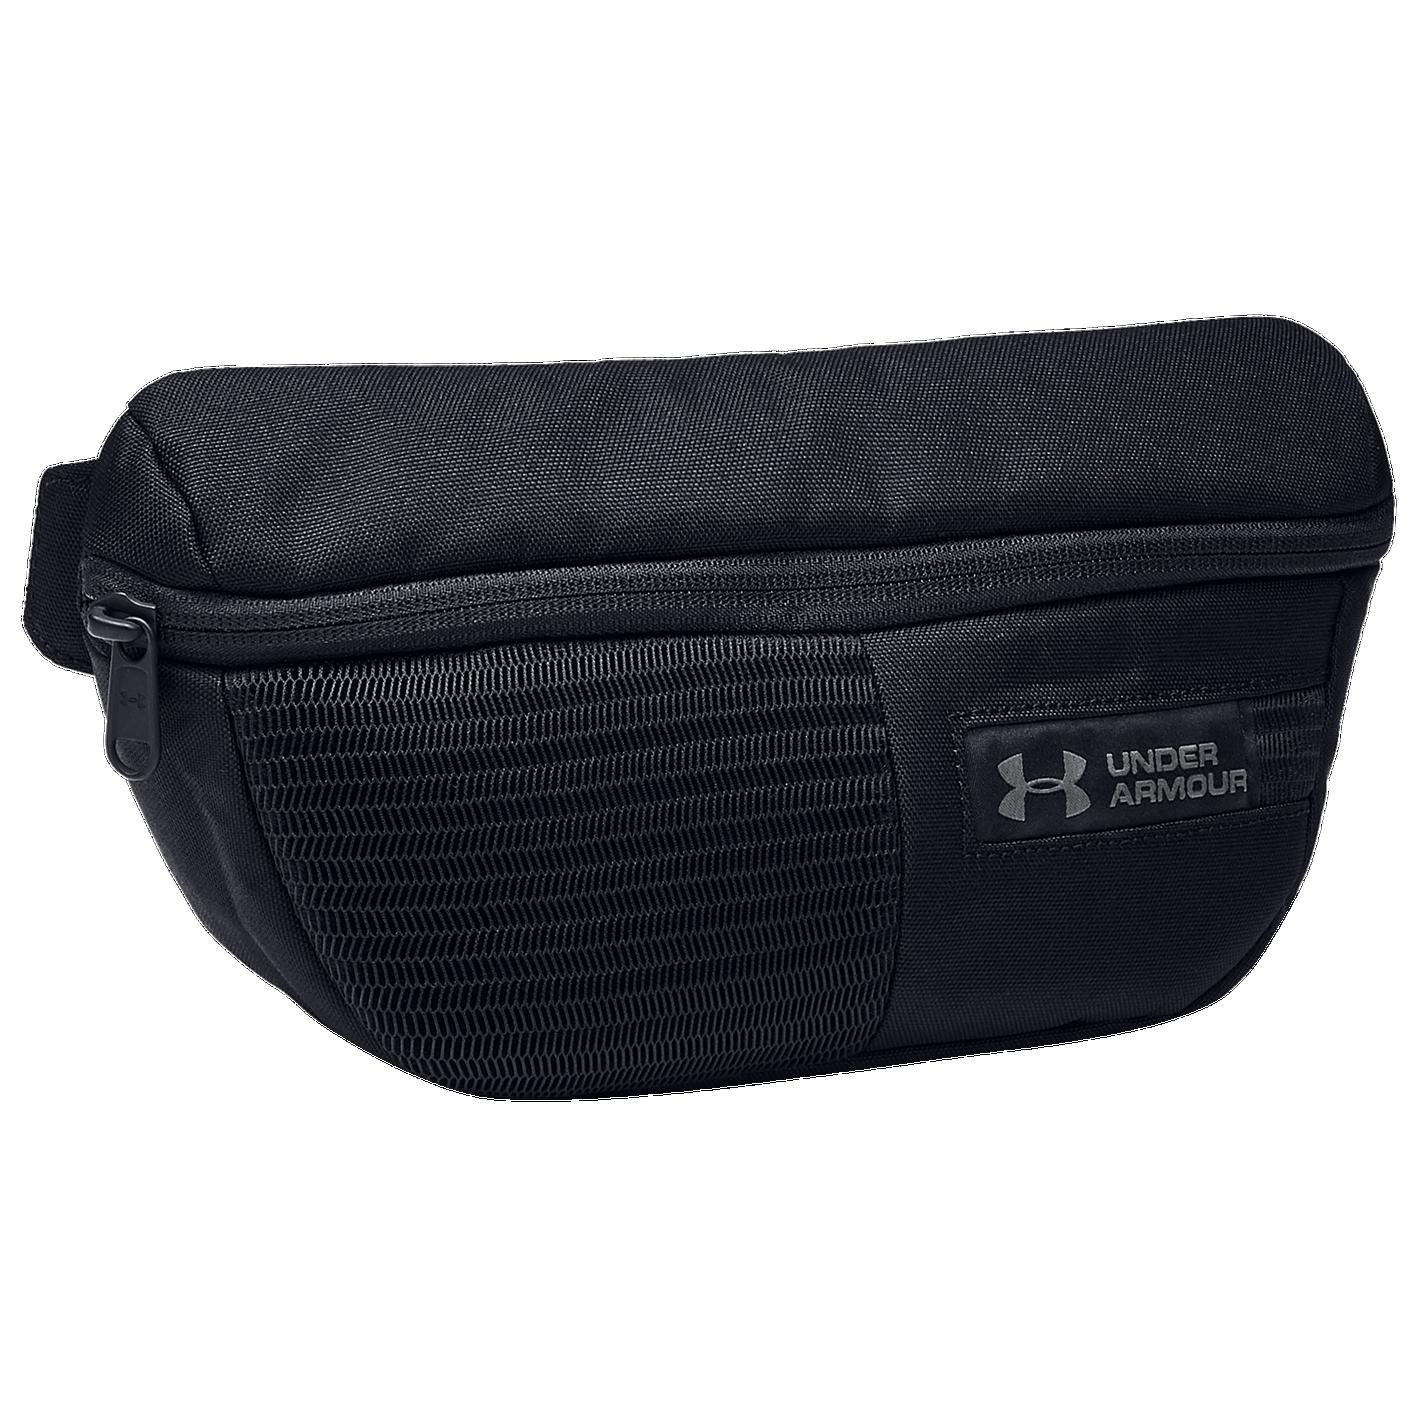 412dbabfe4 Under Armour Waist Bag - Casual - Accessories - Black/Graphite